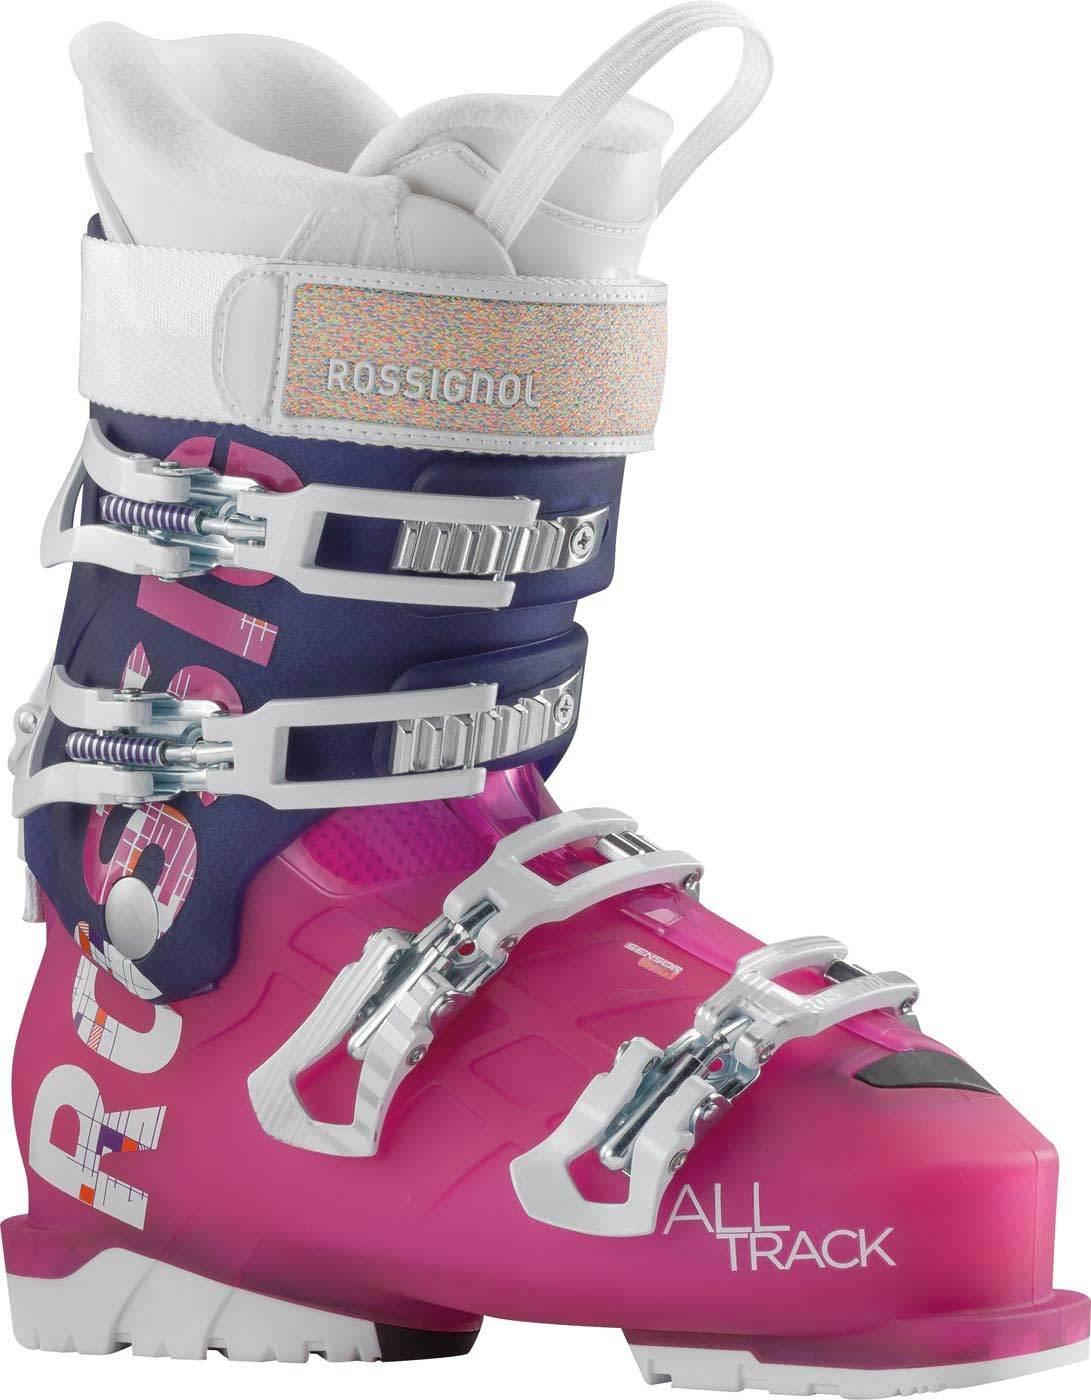 Pure Esquí Para 80 Negro Pro De Botas Rossignol MujerColor RcL43j5Aq